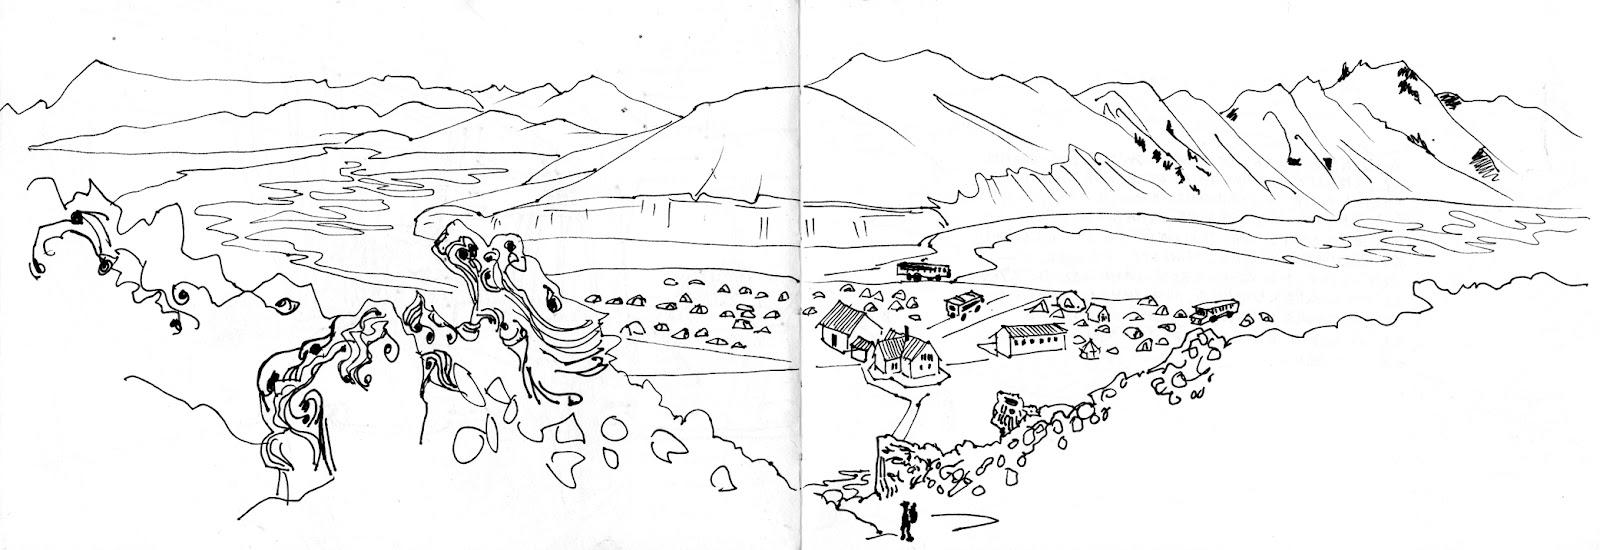 Une marche en Islande: [carnet de bord] 23 & 24 juillet